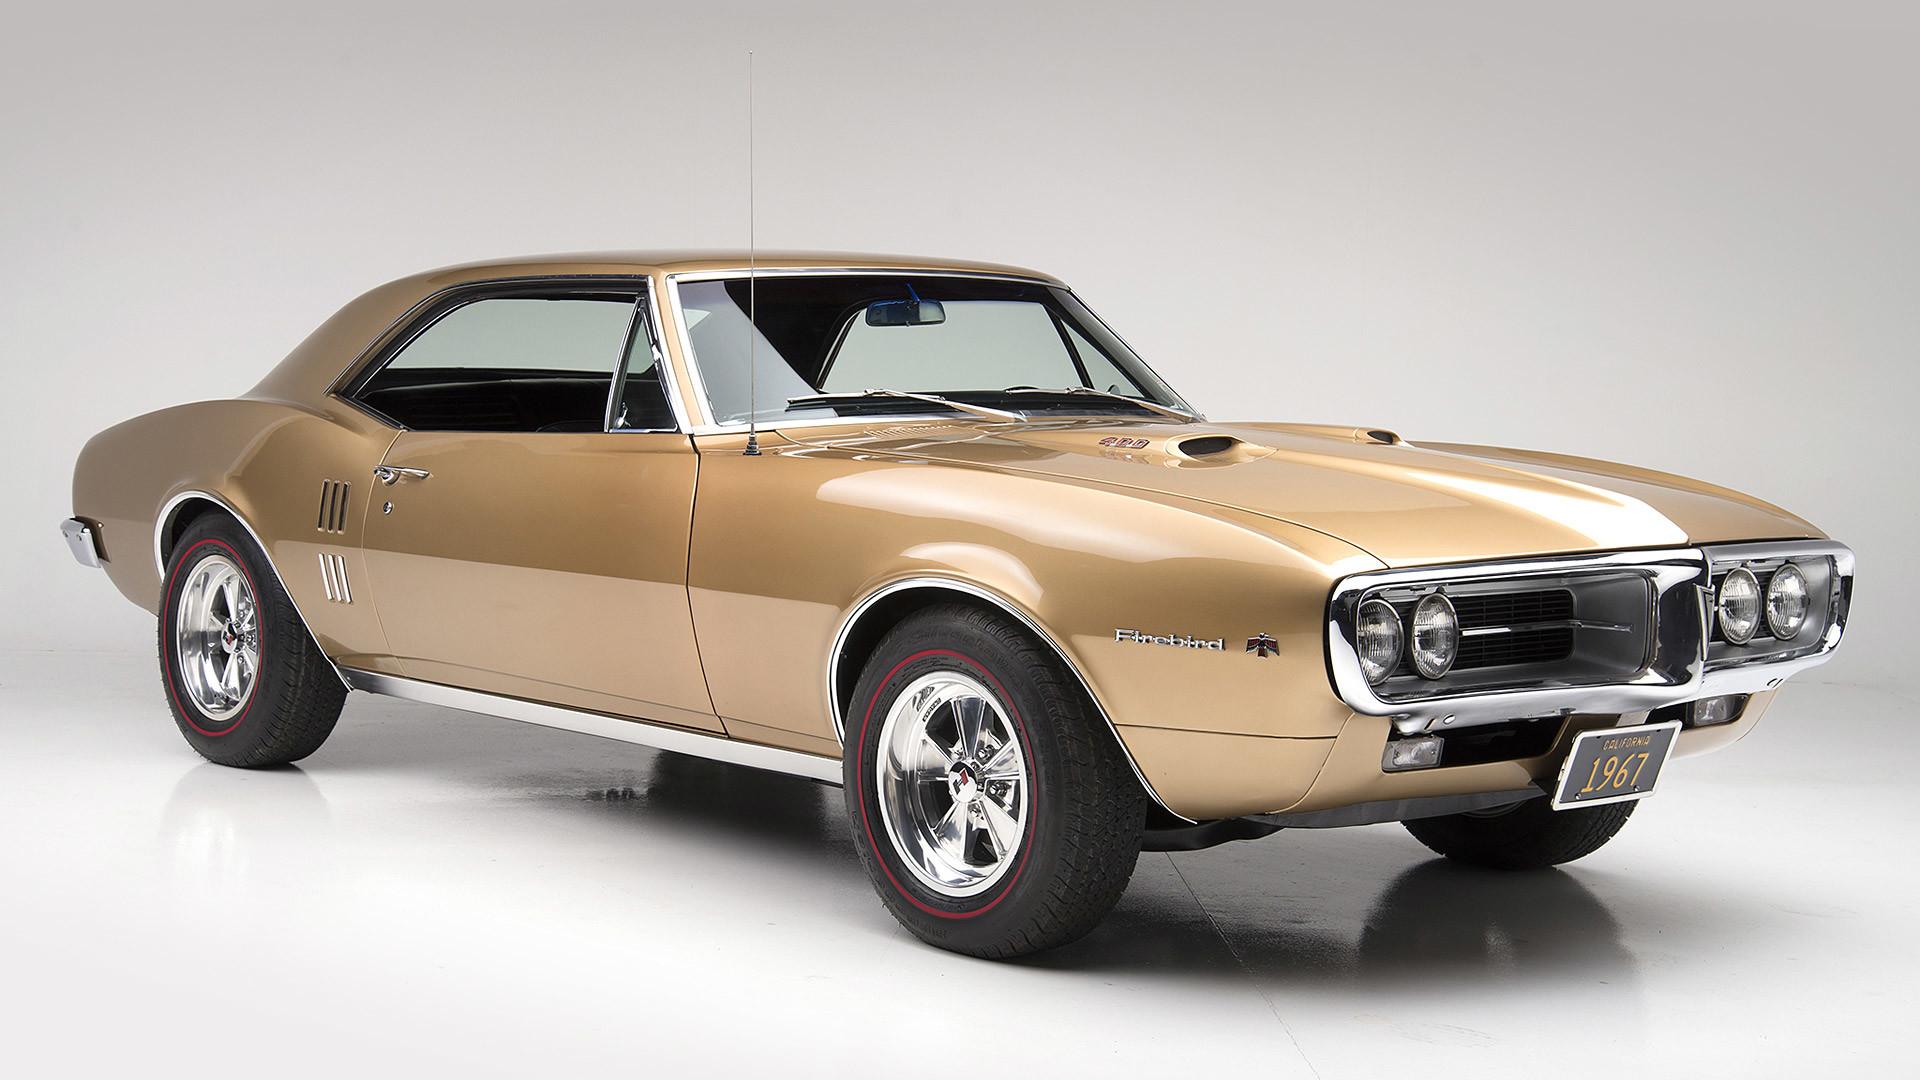 Res: 1920x1080, 1967 Pontiac Firebird 400 picture